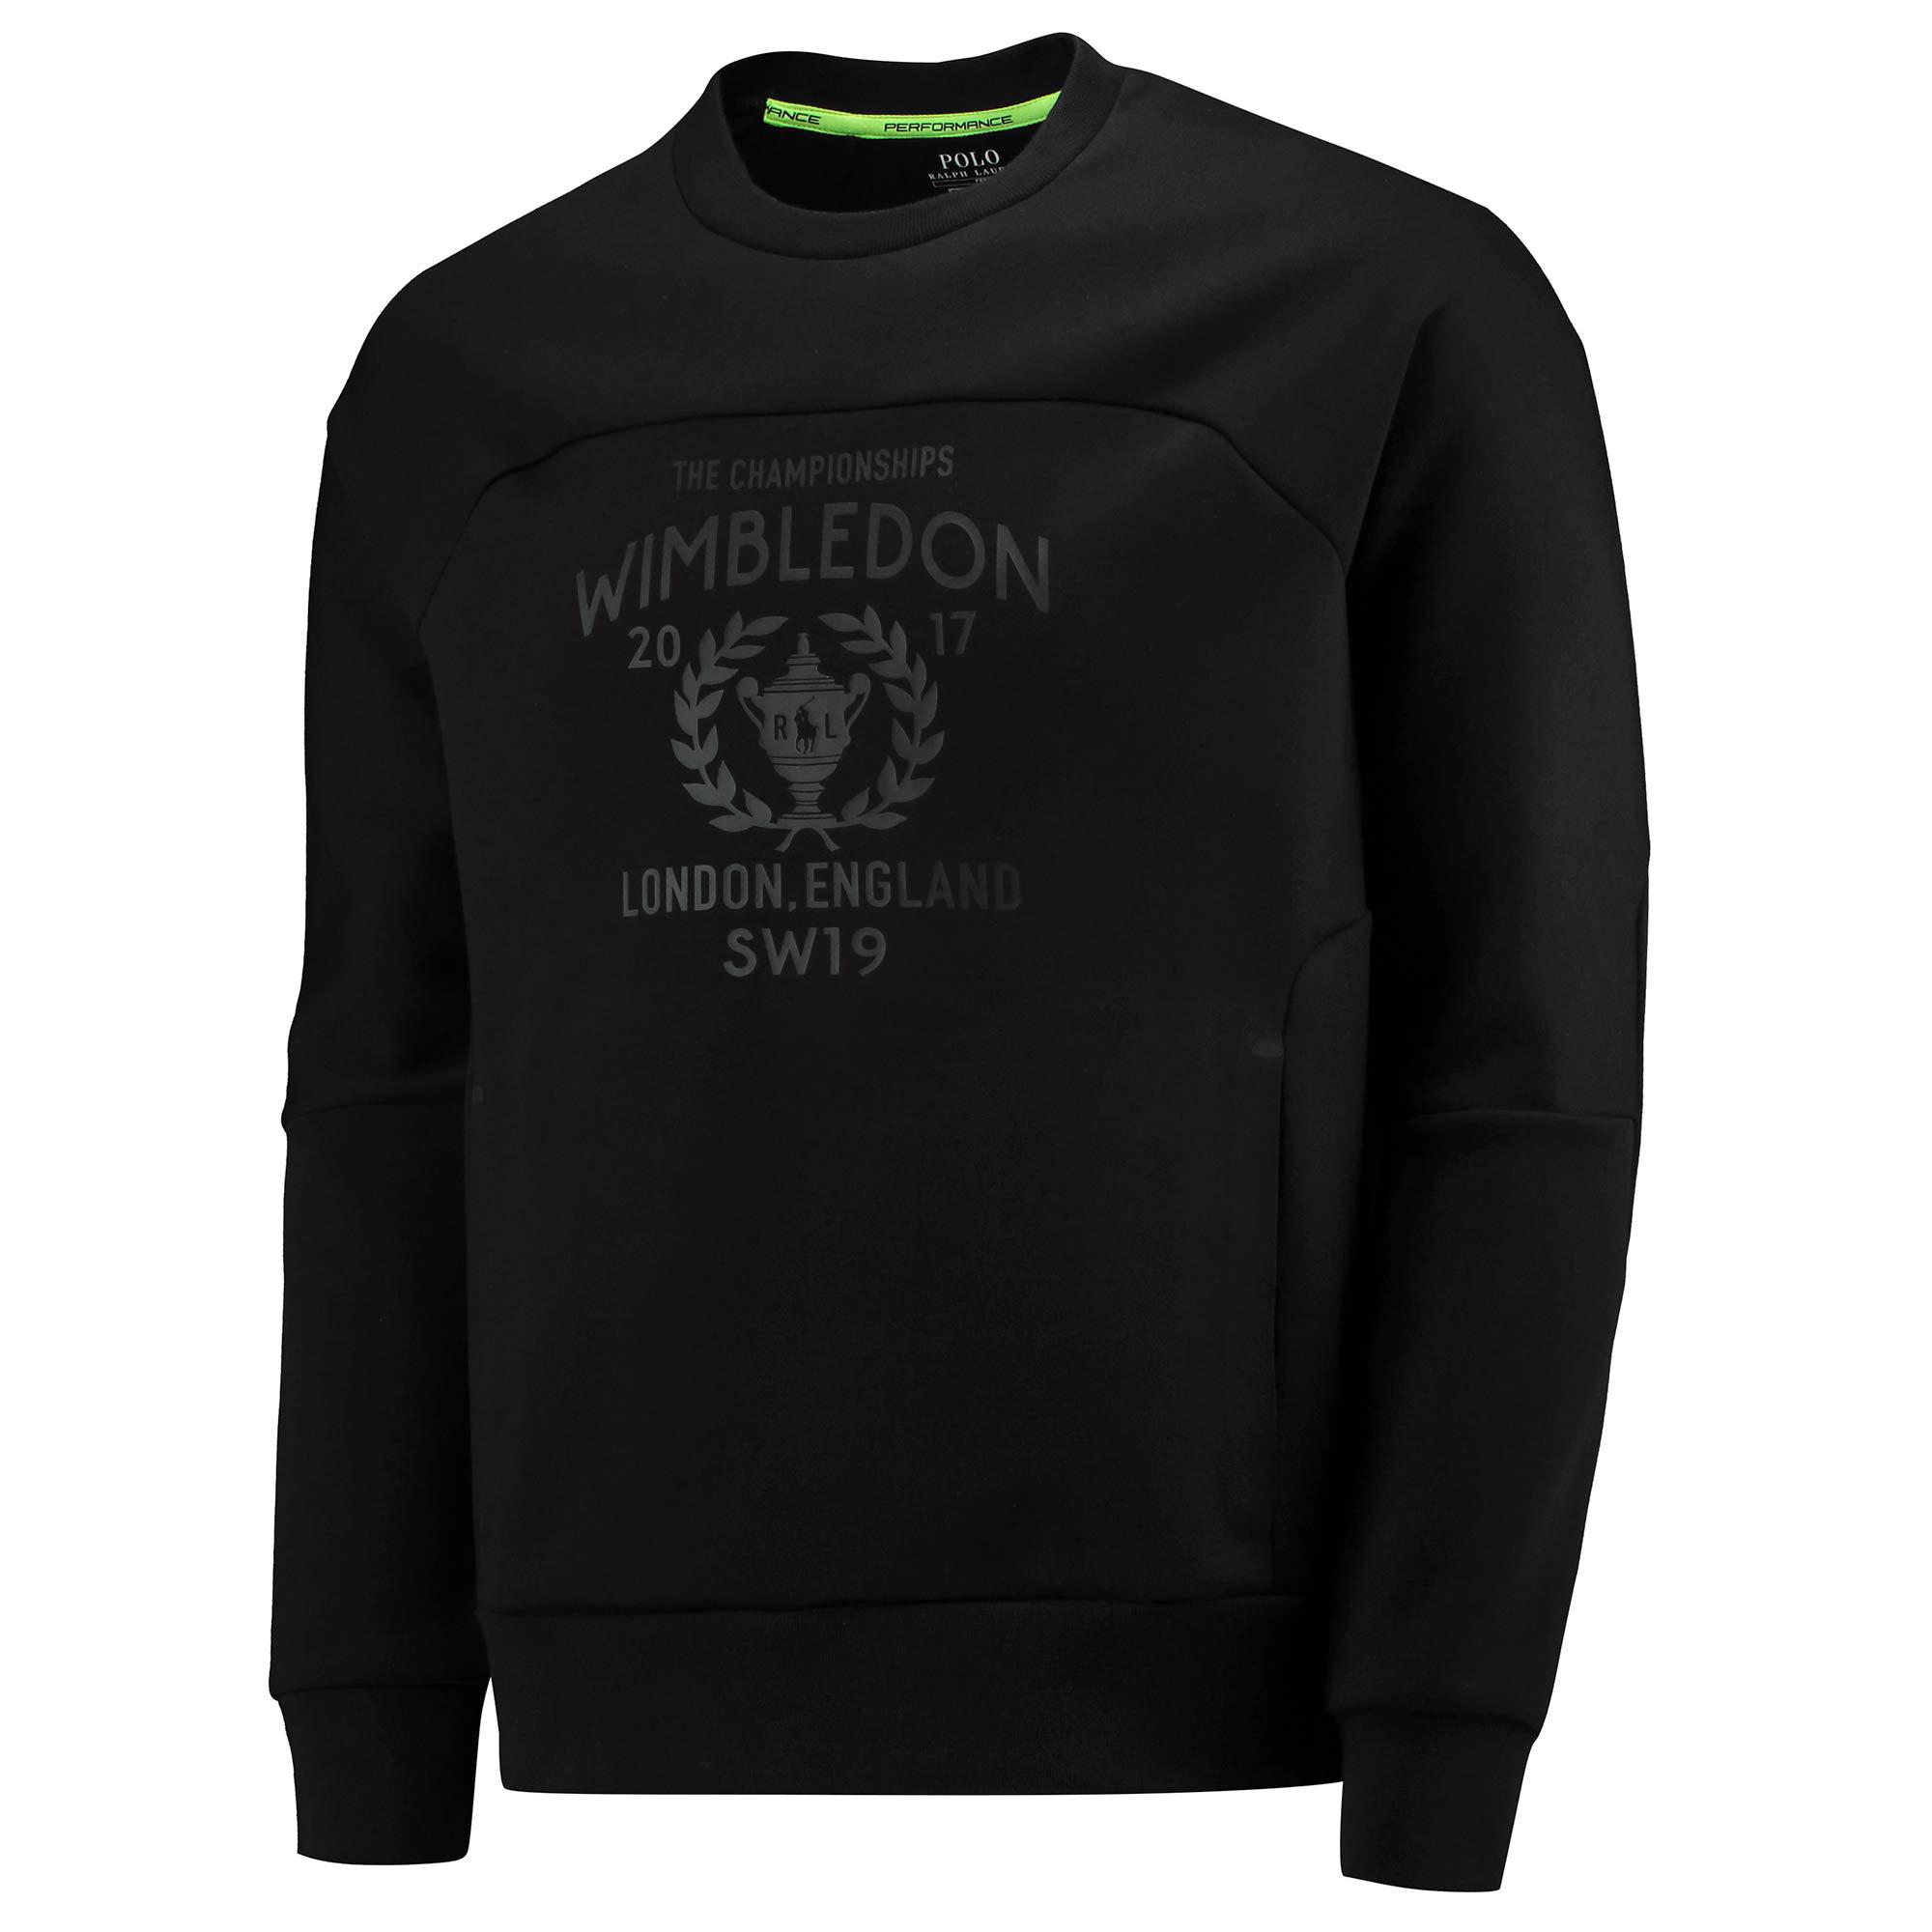 Wimbledon Ralph Lauren SPORT Sweatshirt - Black